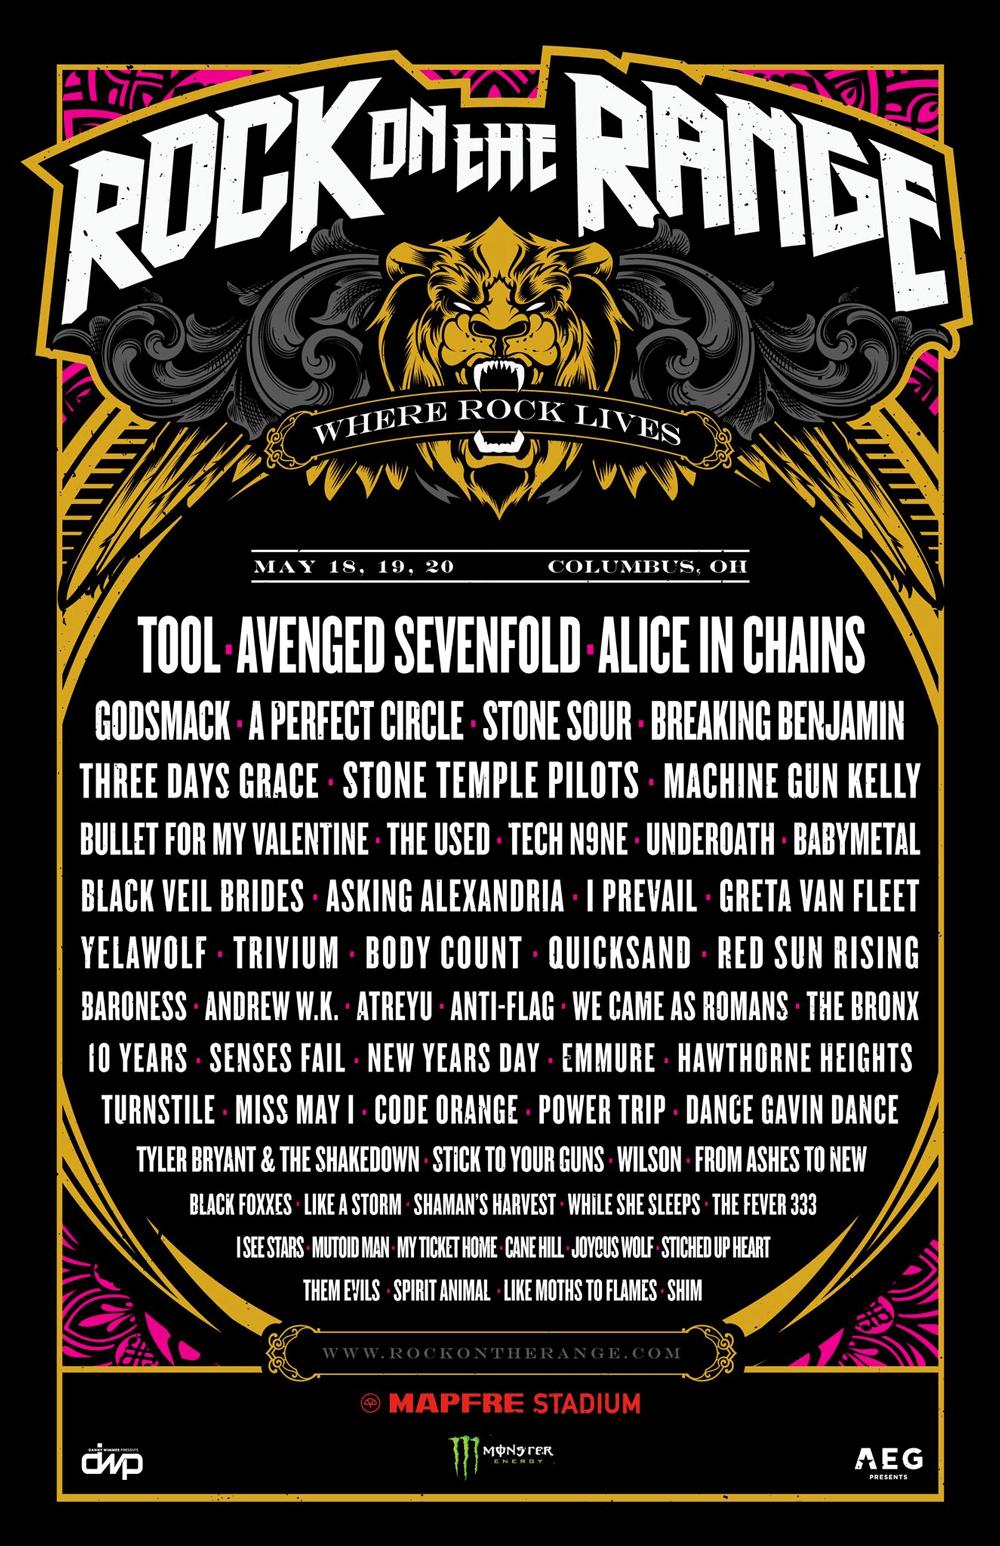 Rock on the Range 2018 lineup